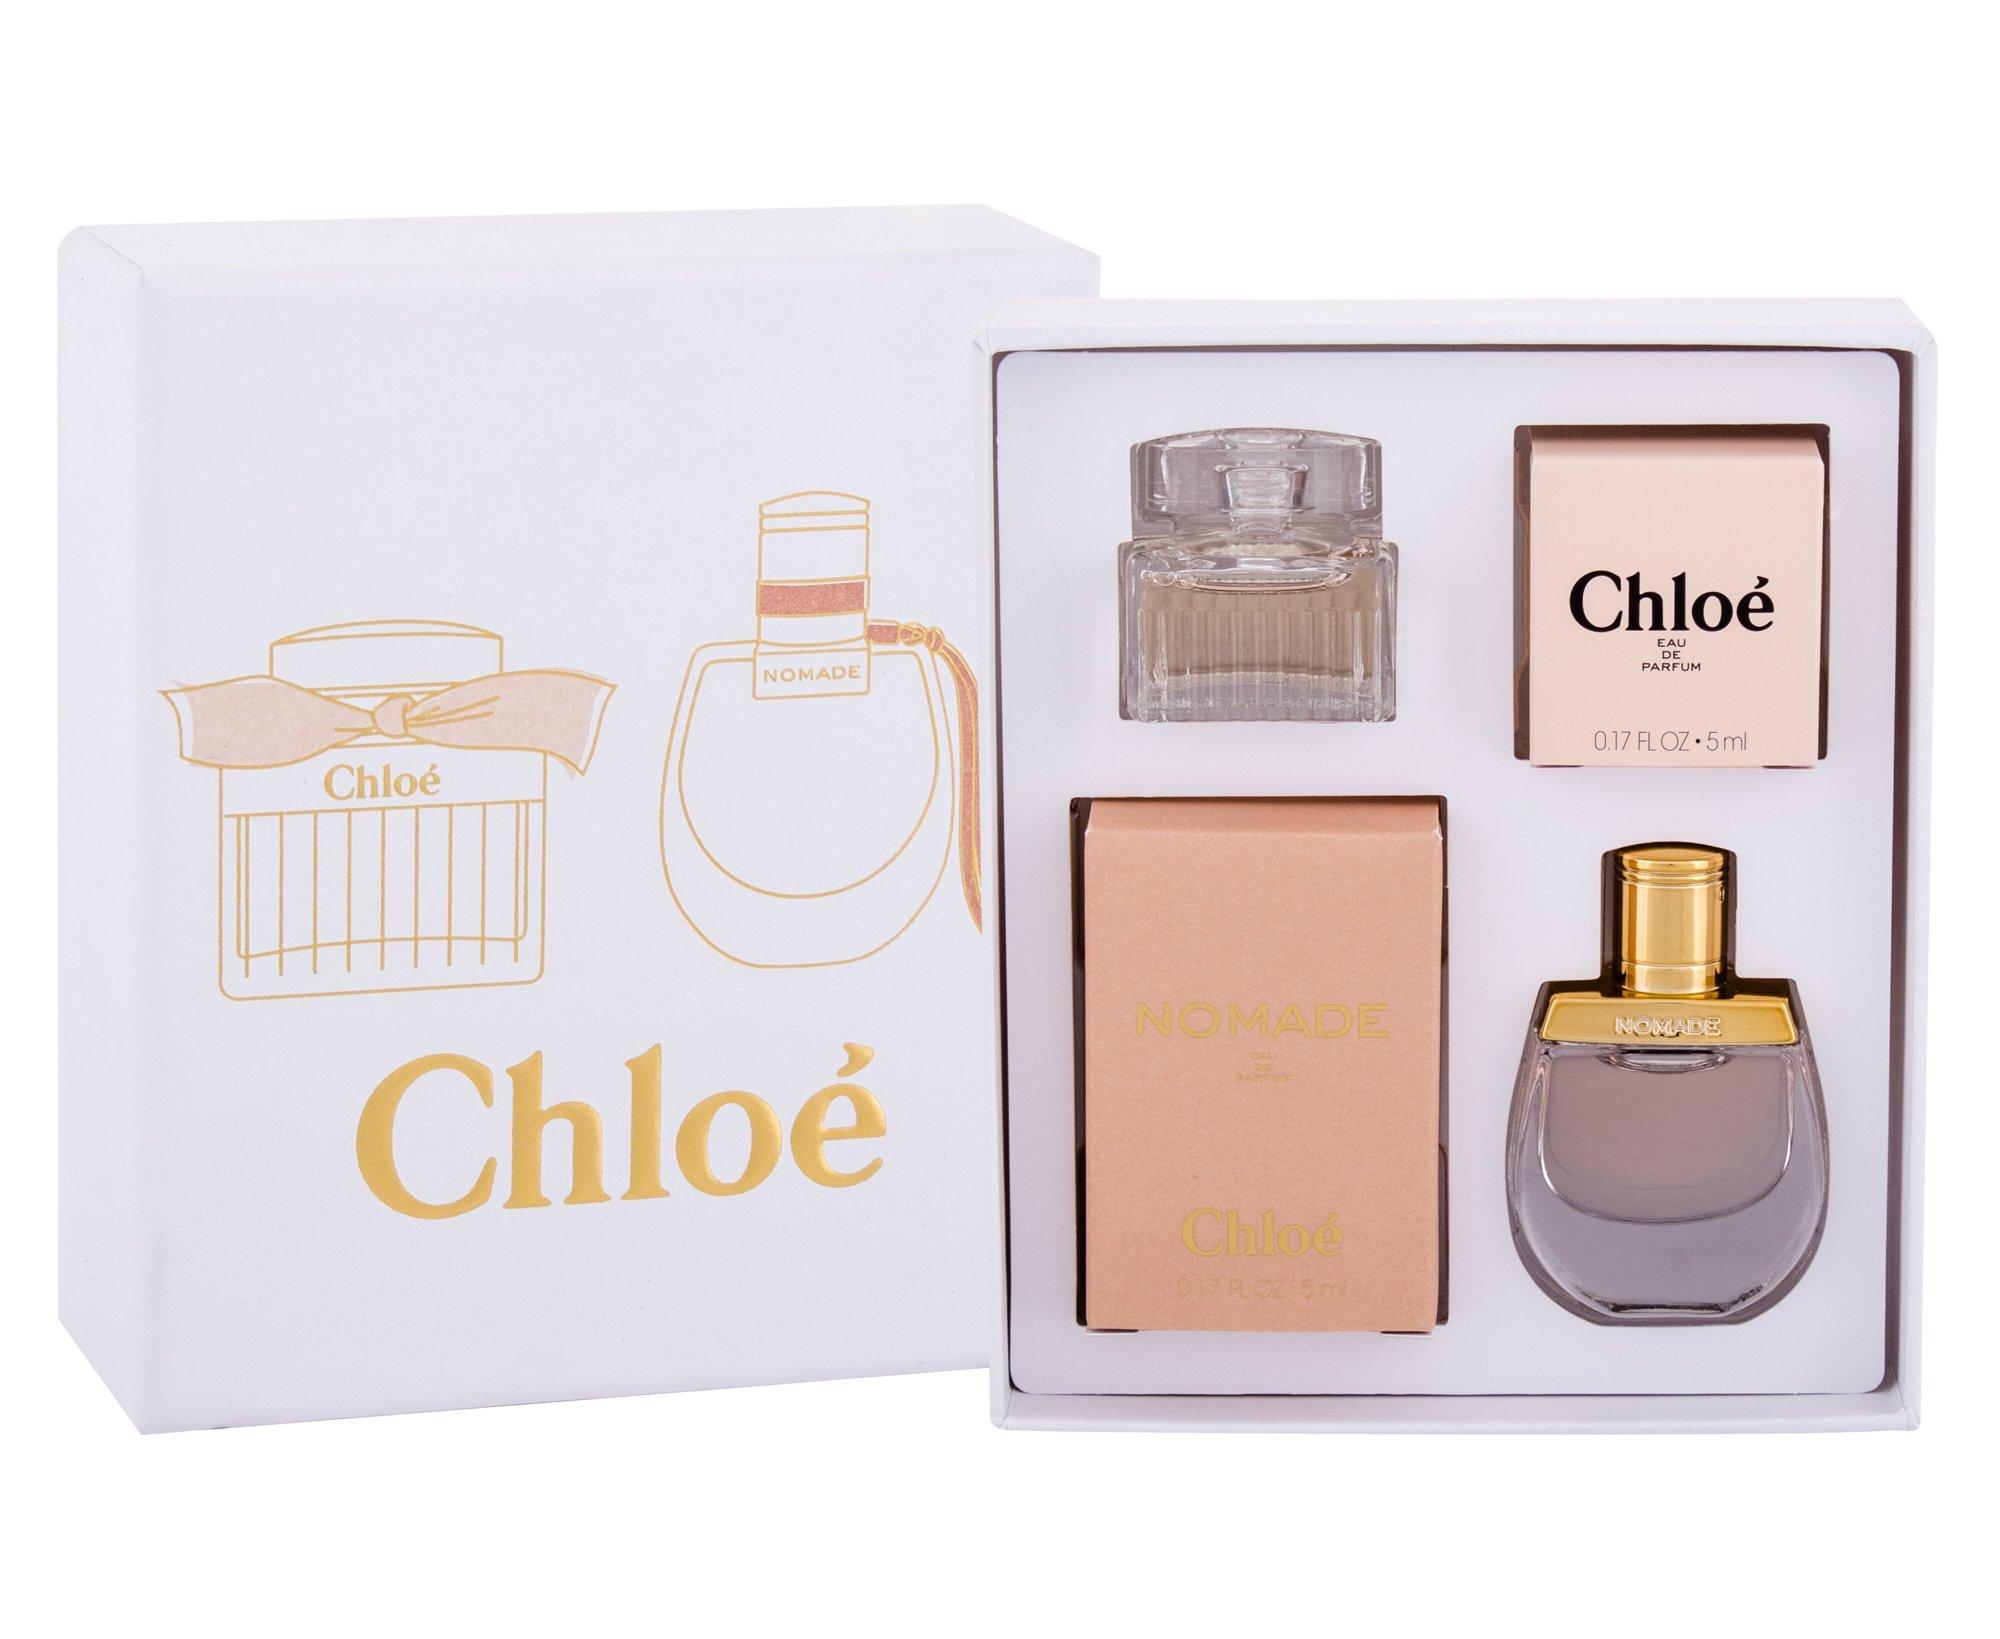 Chloé - Chloé EDP 5 ml + Nomade EDP 5 ml - Giftset